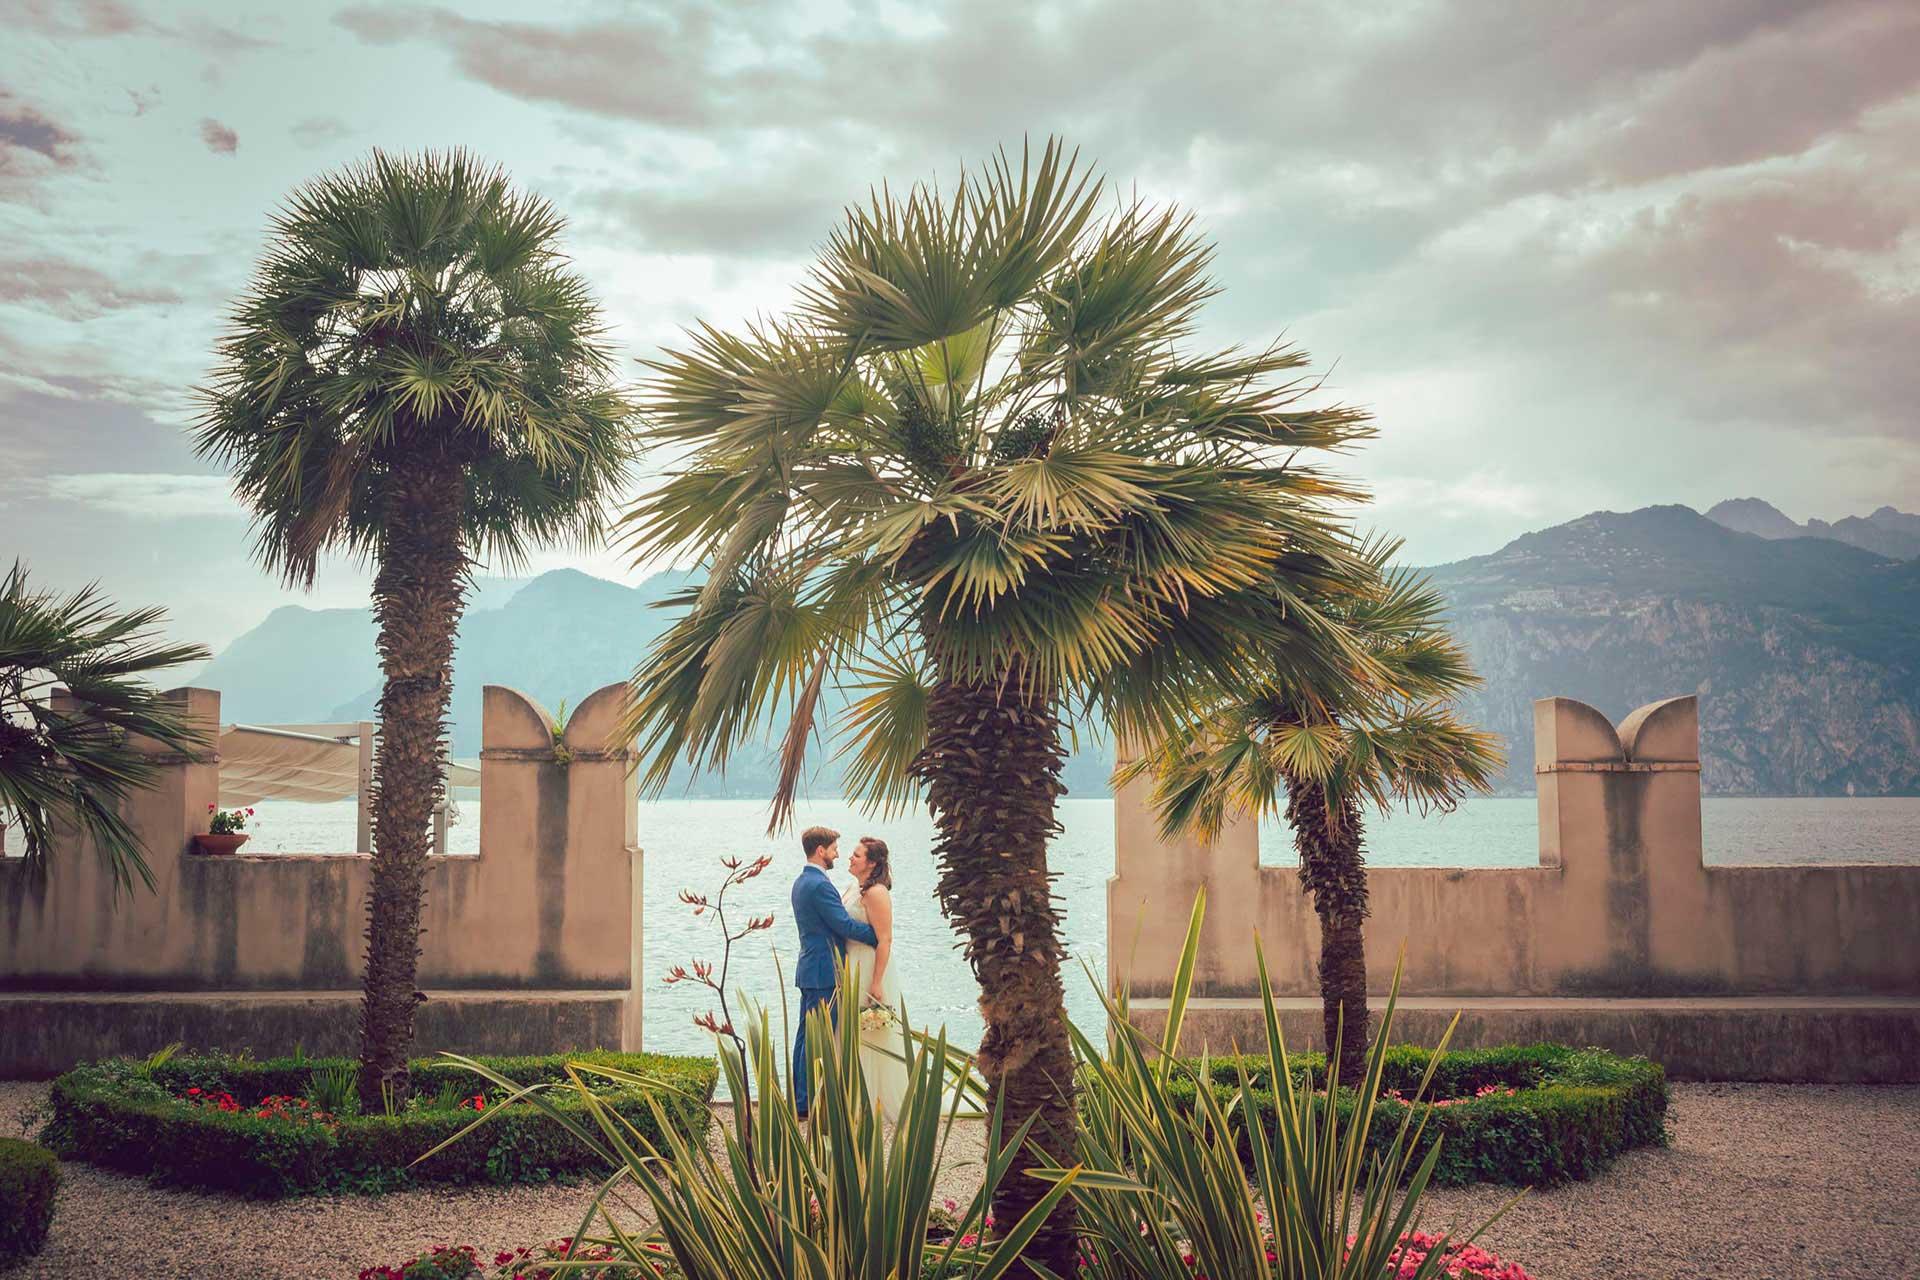 Lake Garda Wedding Photographer - Malcesine Wedding Photographer servizi fotografici GLPSTUDIO FOTO VIDEO LAZISE CELL. 335 5234158